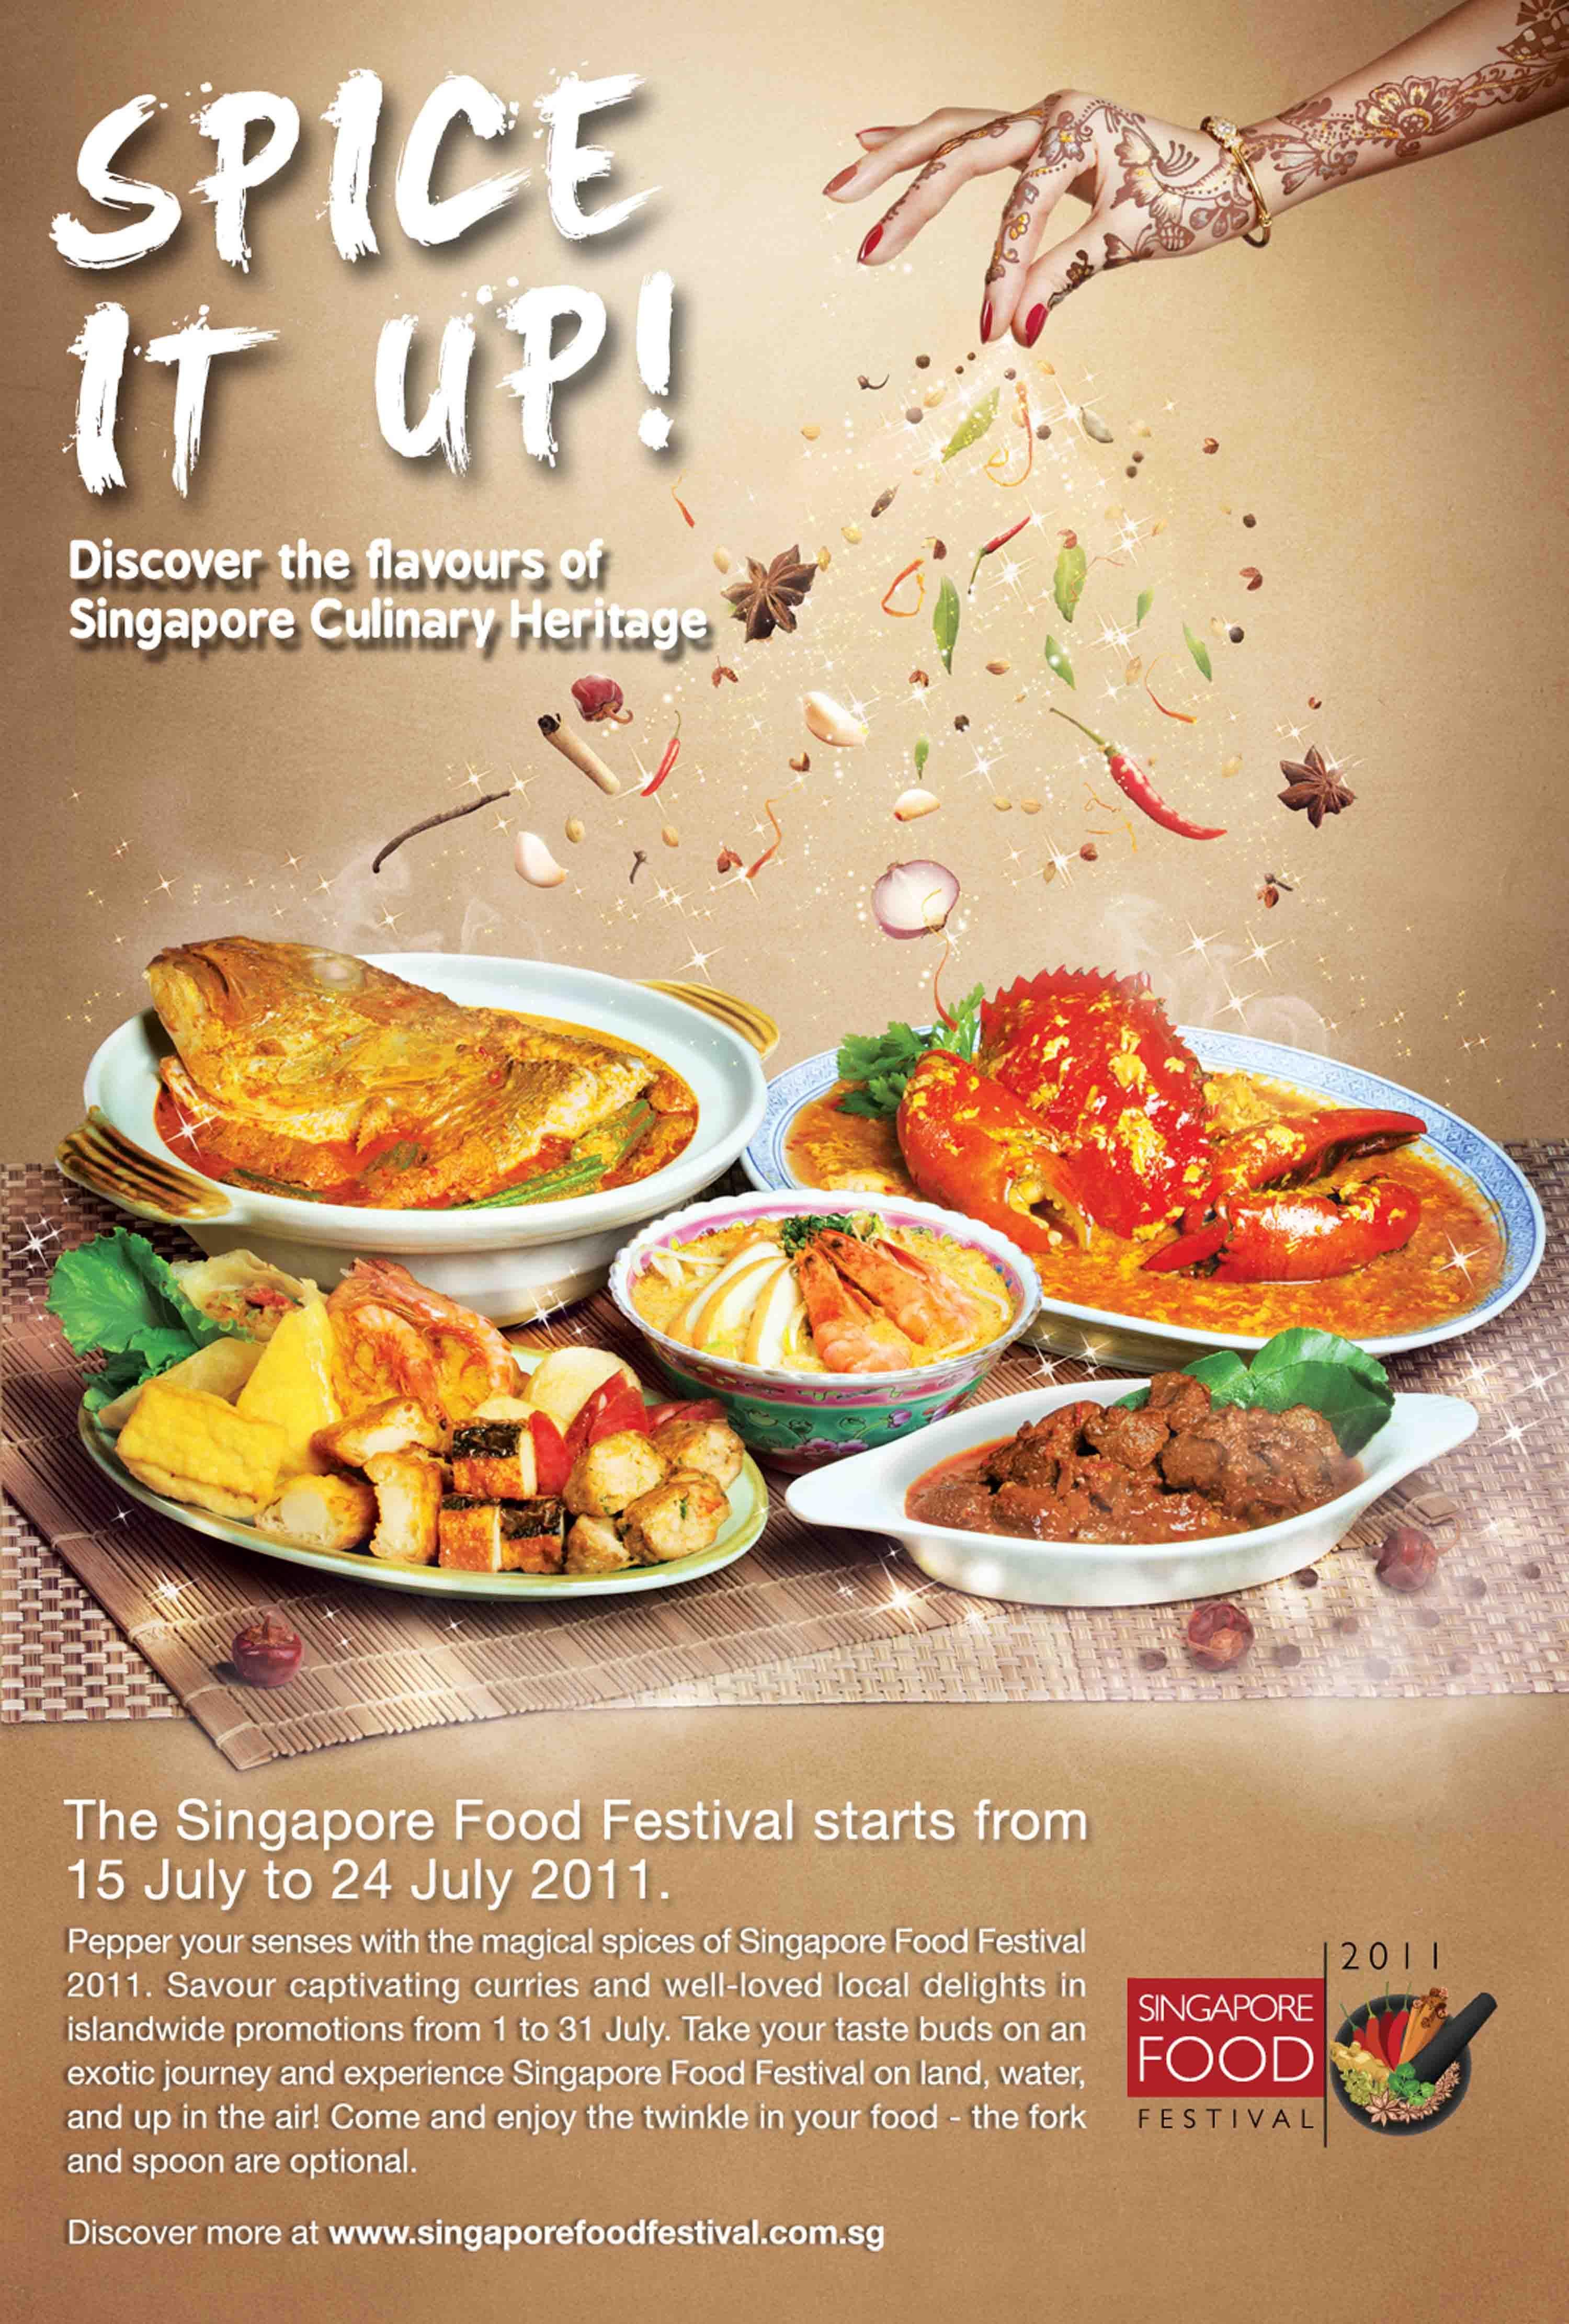 asian food festival poster - google search | dsgn | pinterest